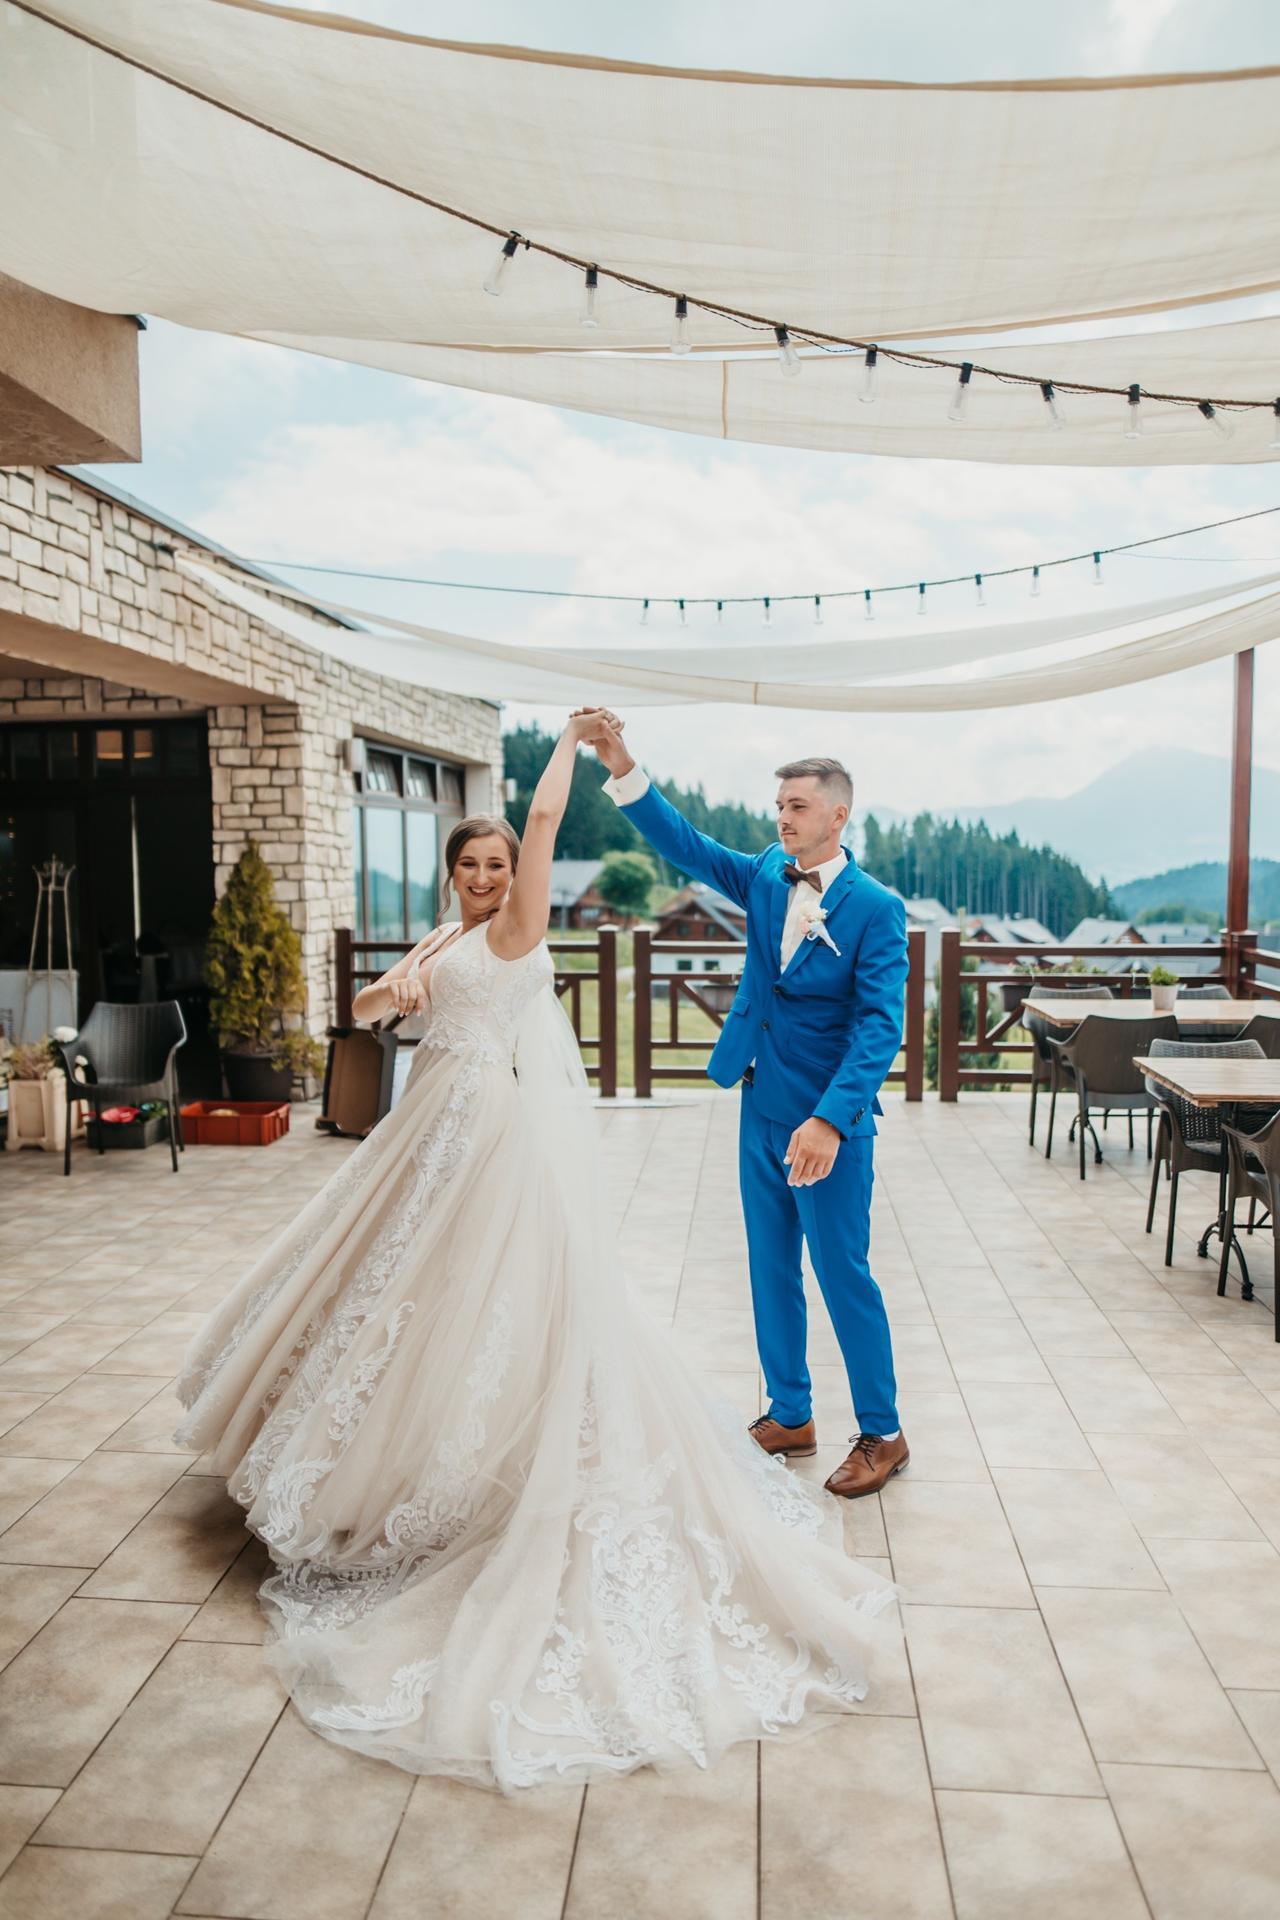 Our wedding ❤️ - Obrázok č. 5